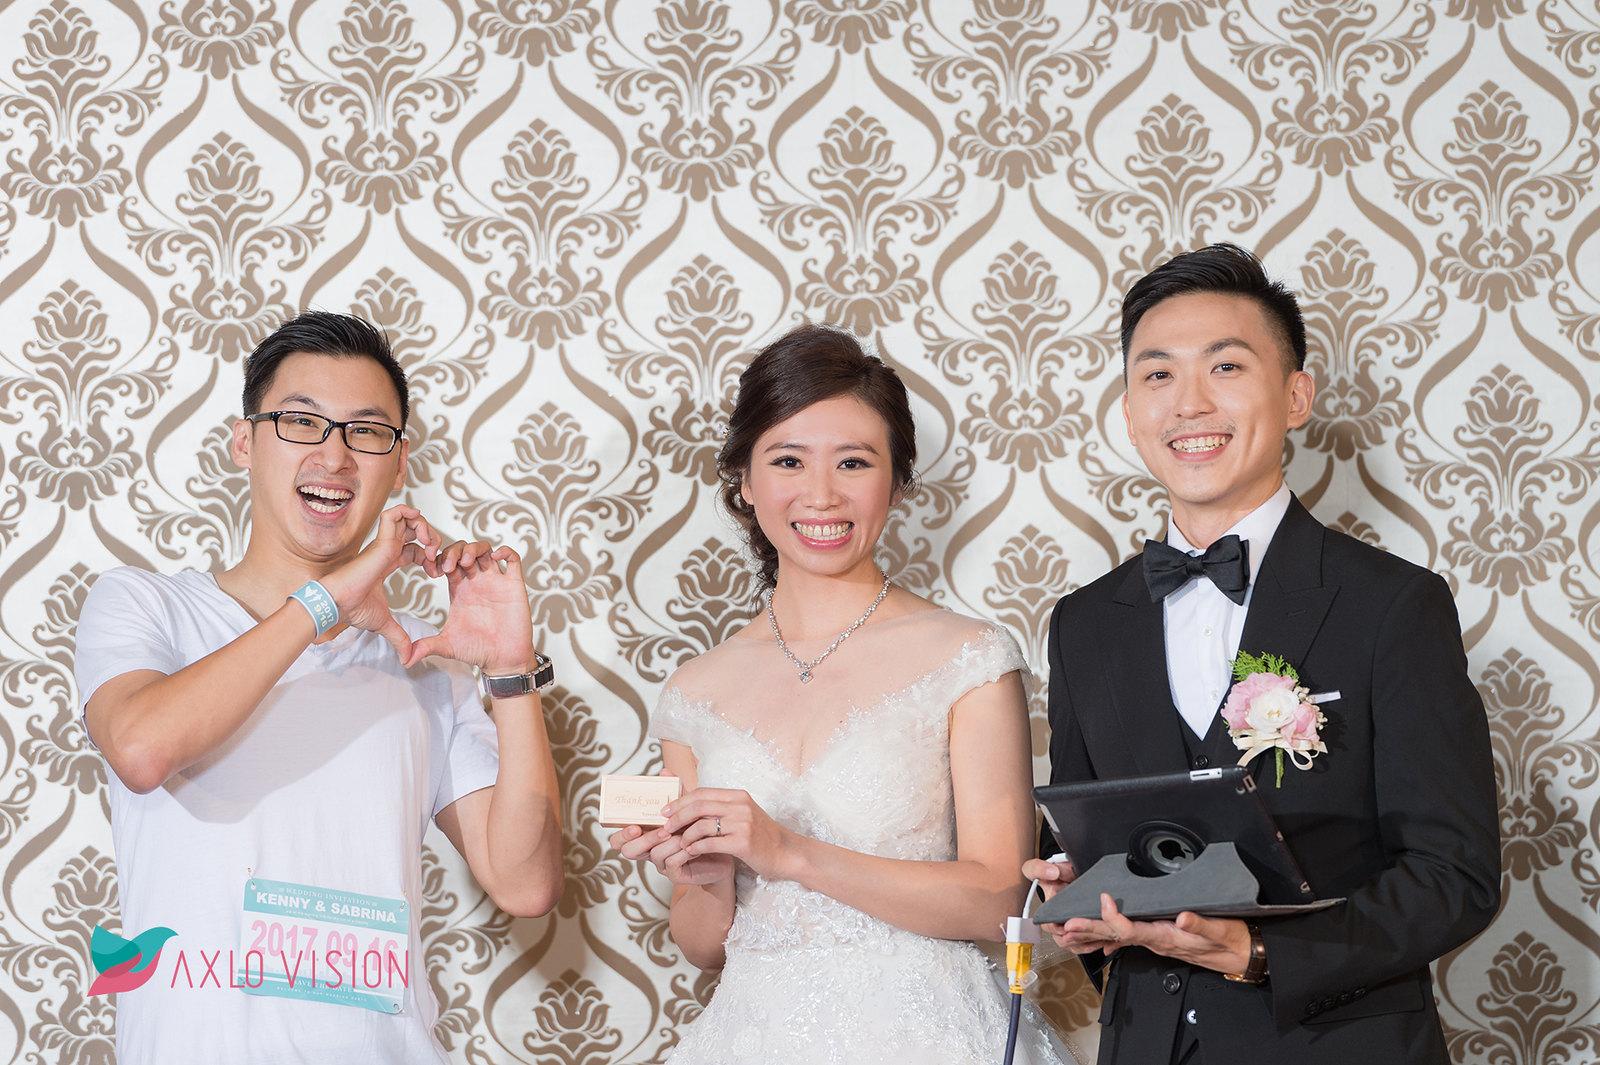 20170916 WeddingDay_154